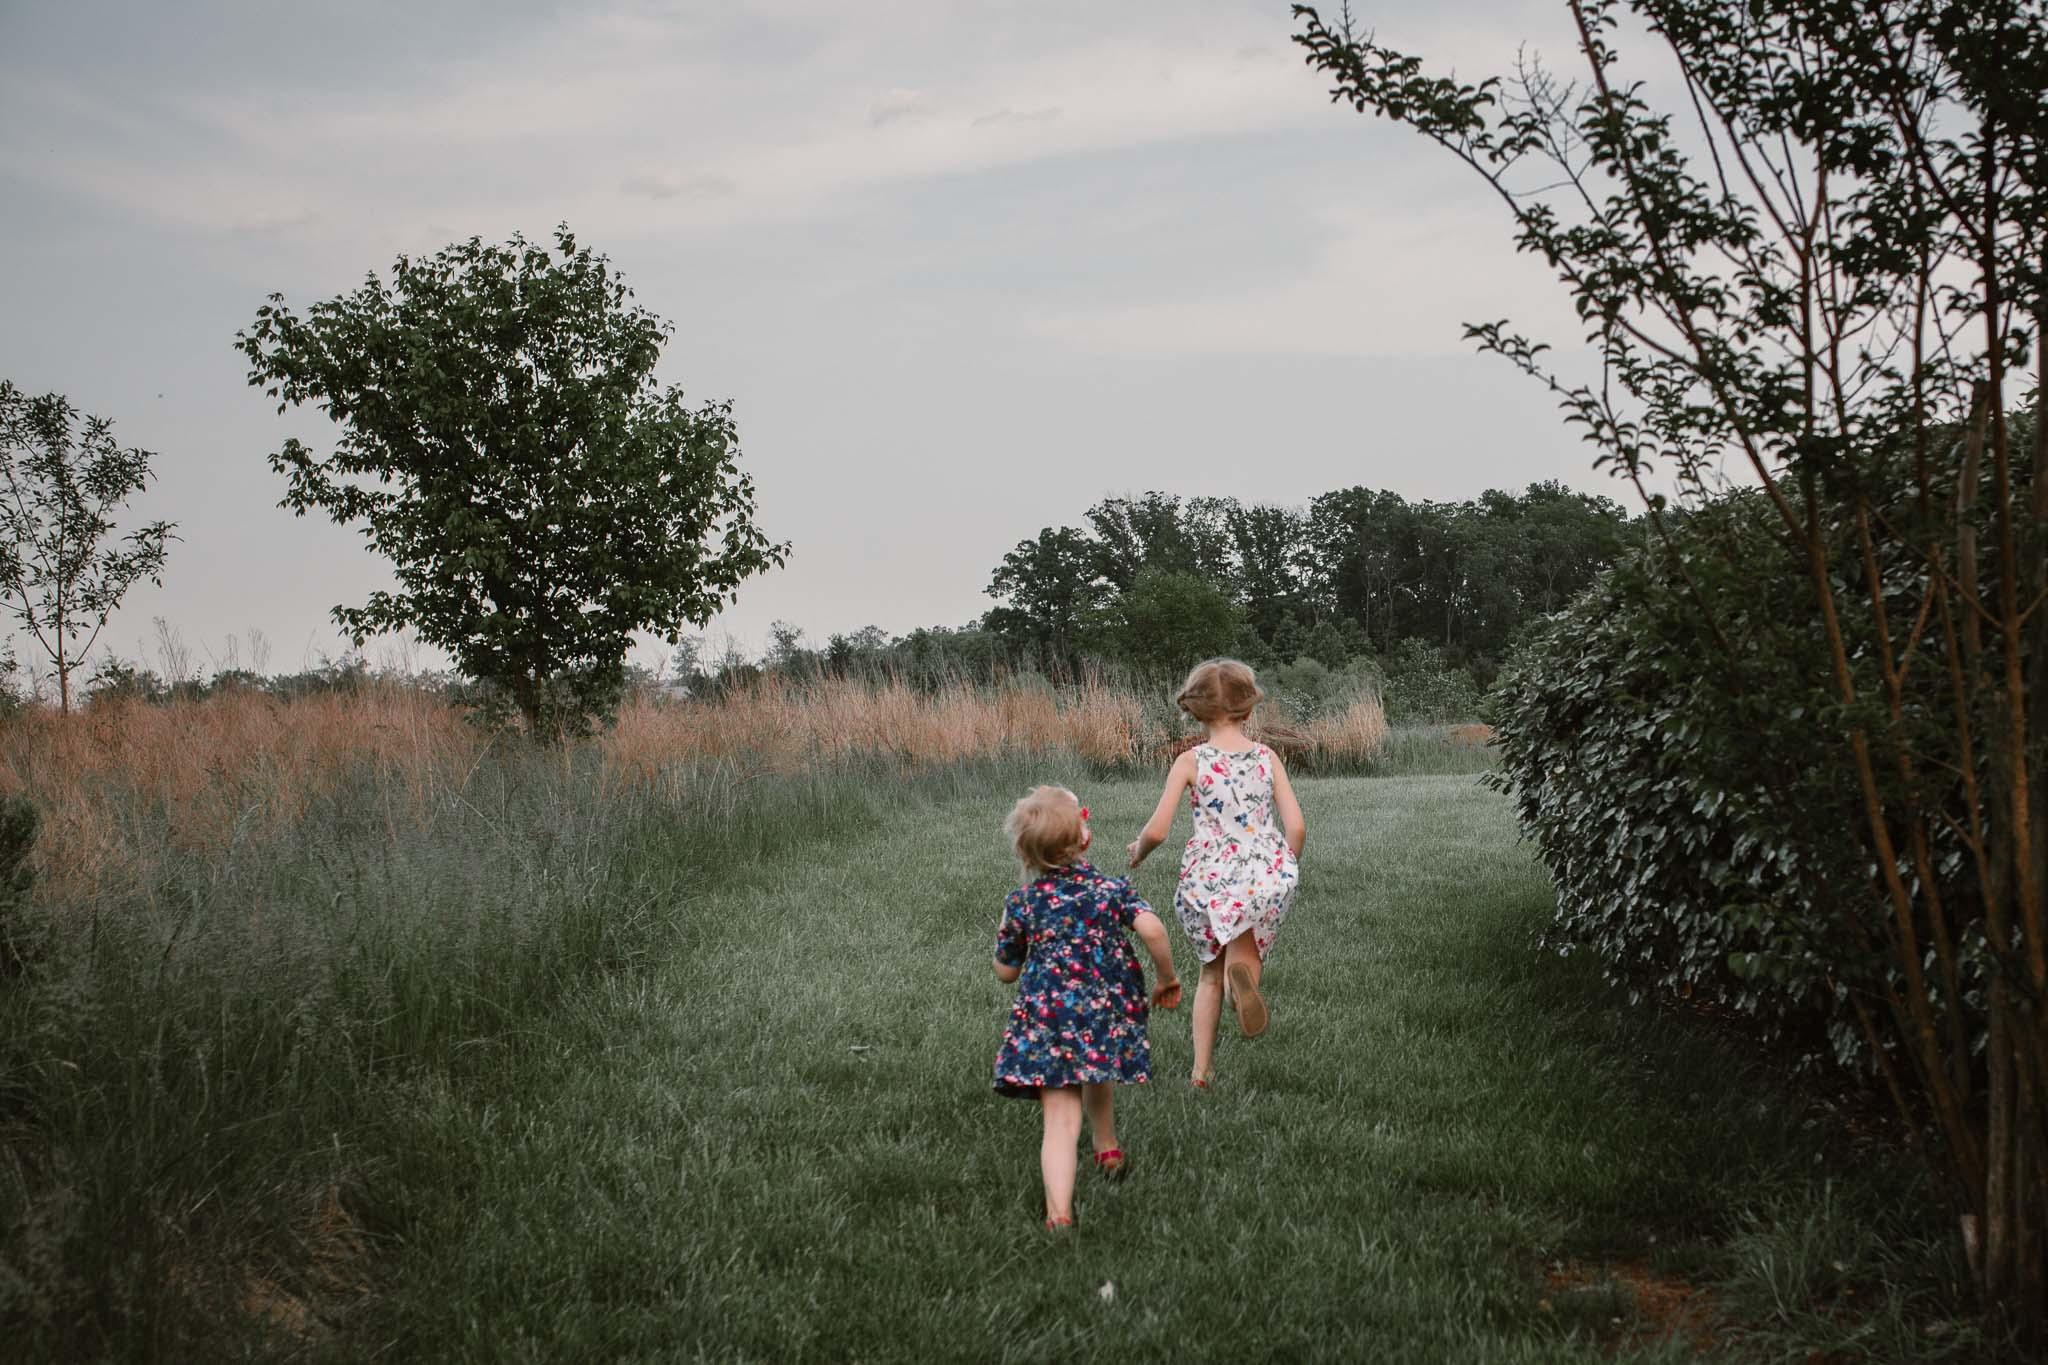 Two sisters race away through a field  at Beaverdam Run in Ashburn, Virginia